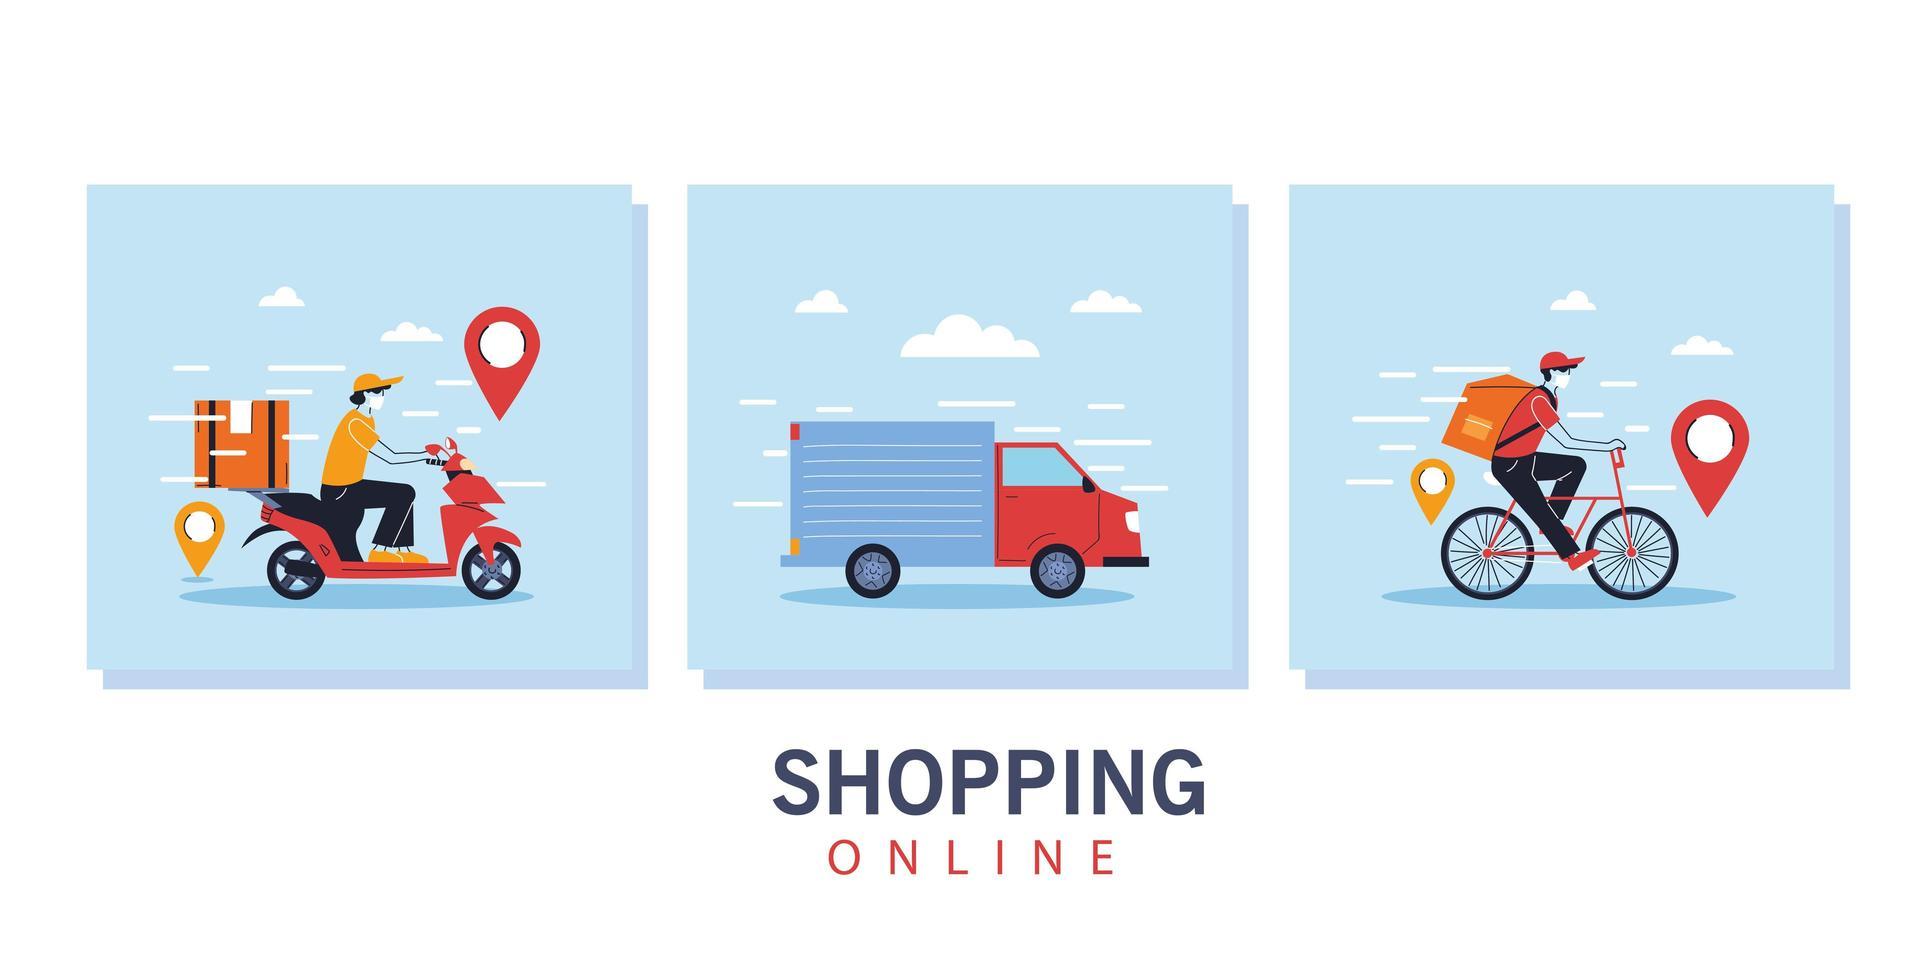 levering, service, transport en logistiek vector